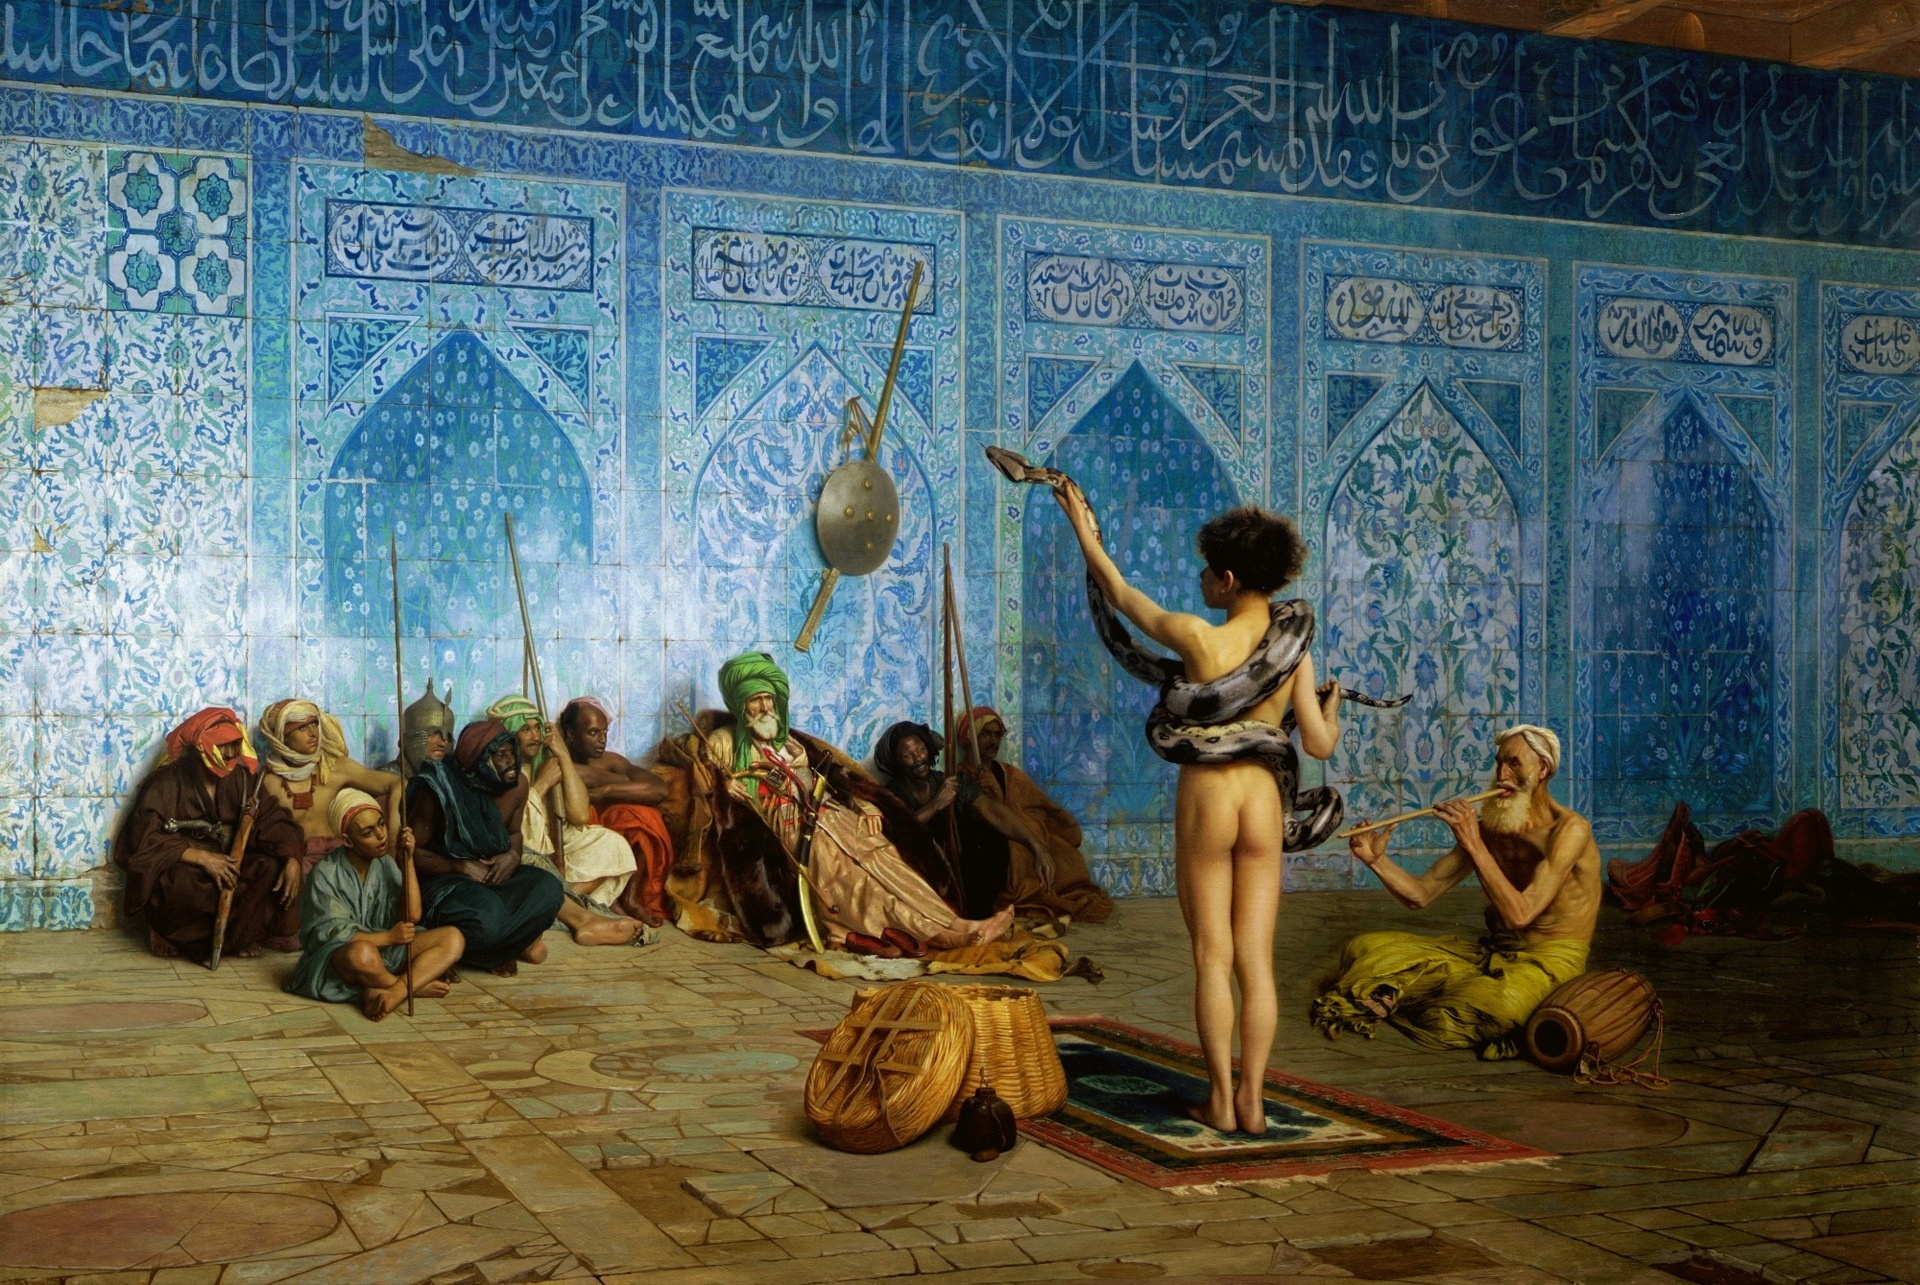 slave to the sultan скачать торрент